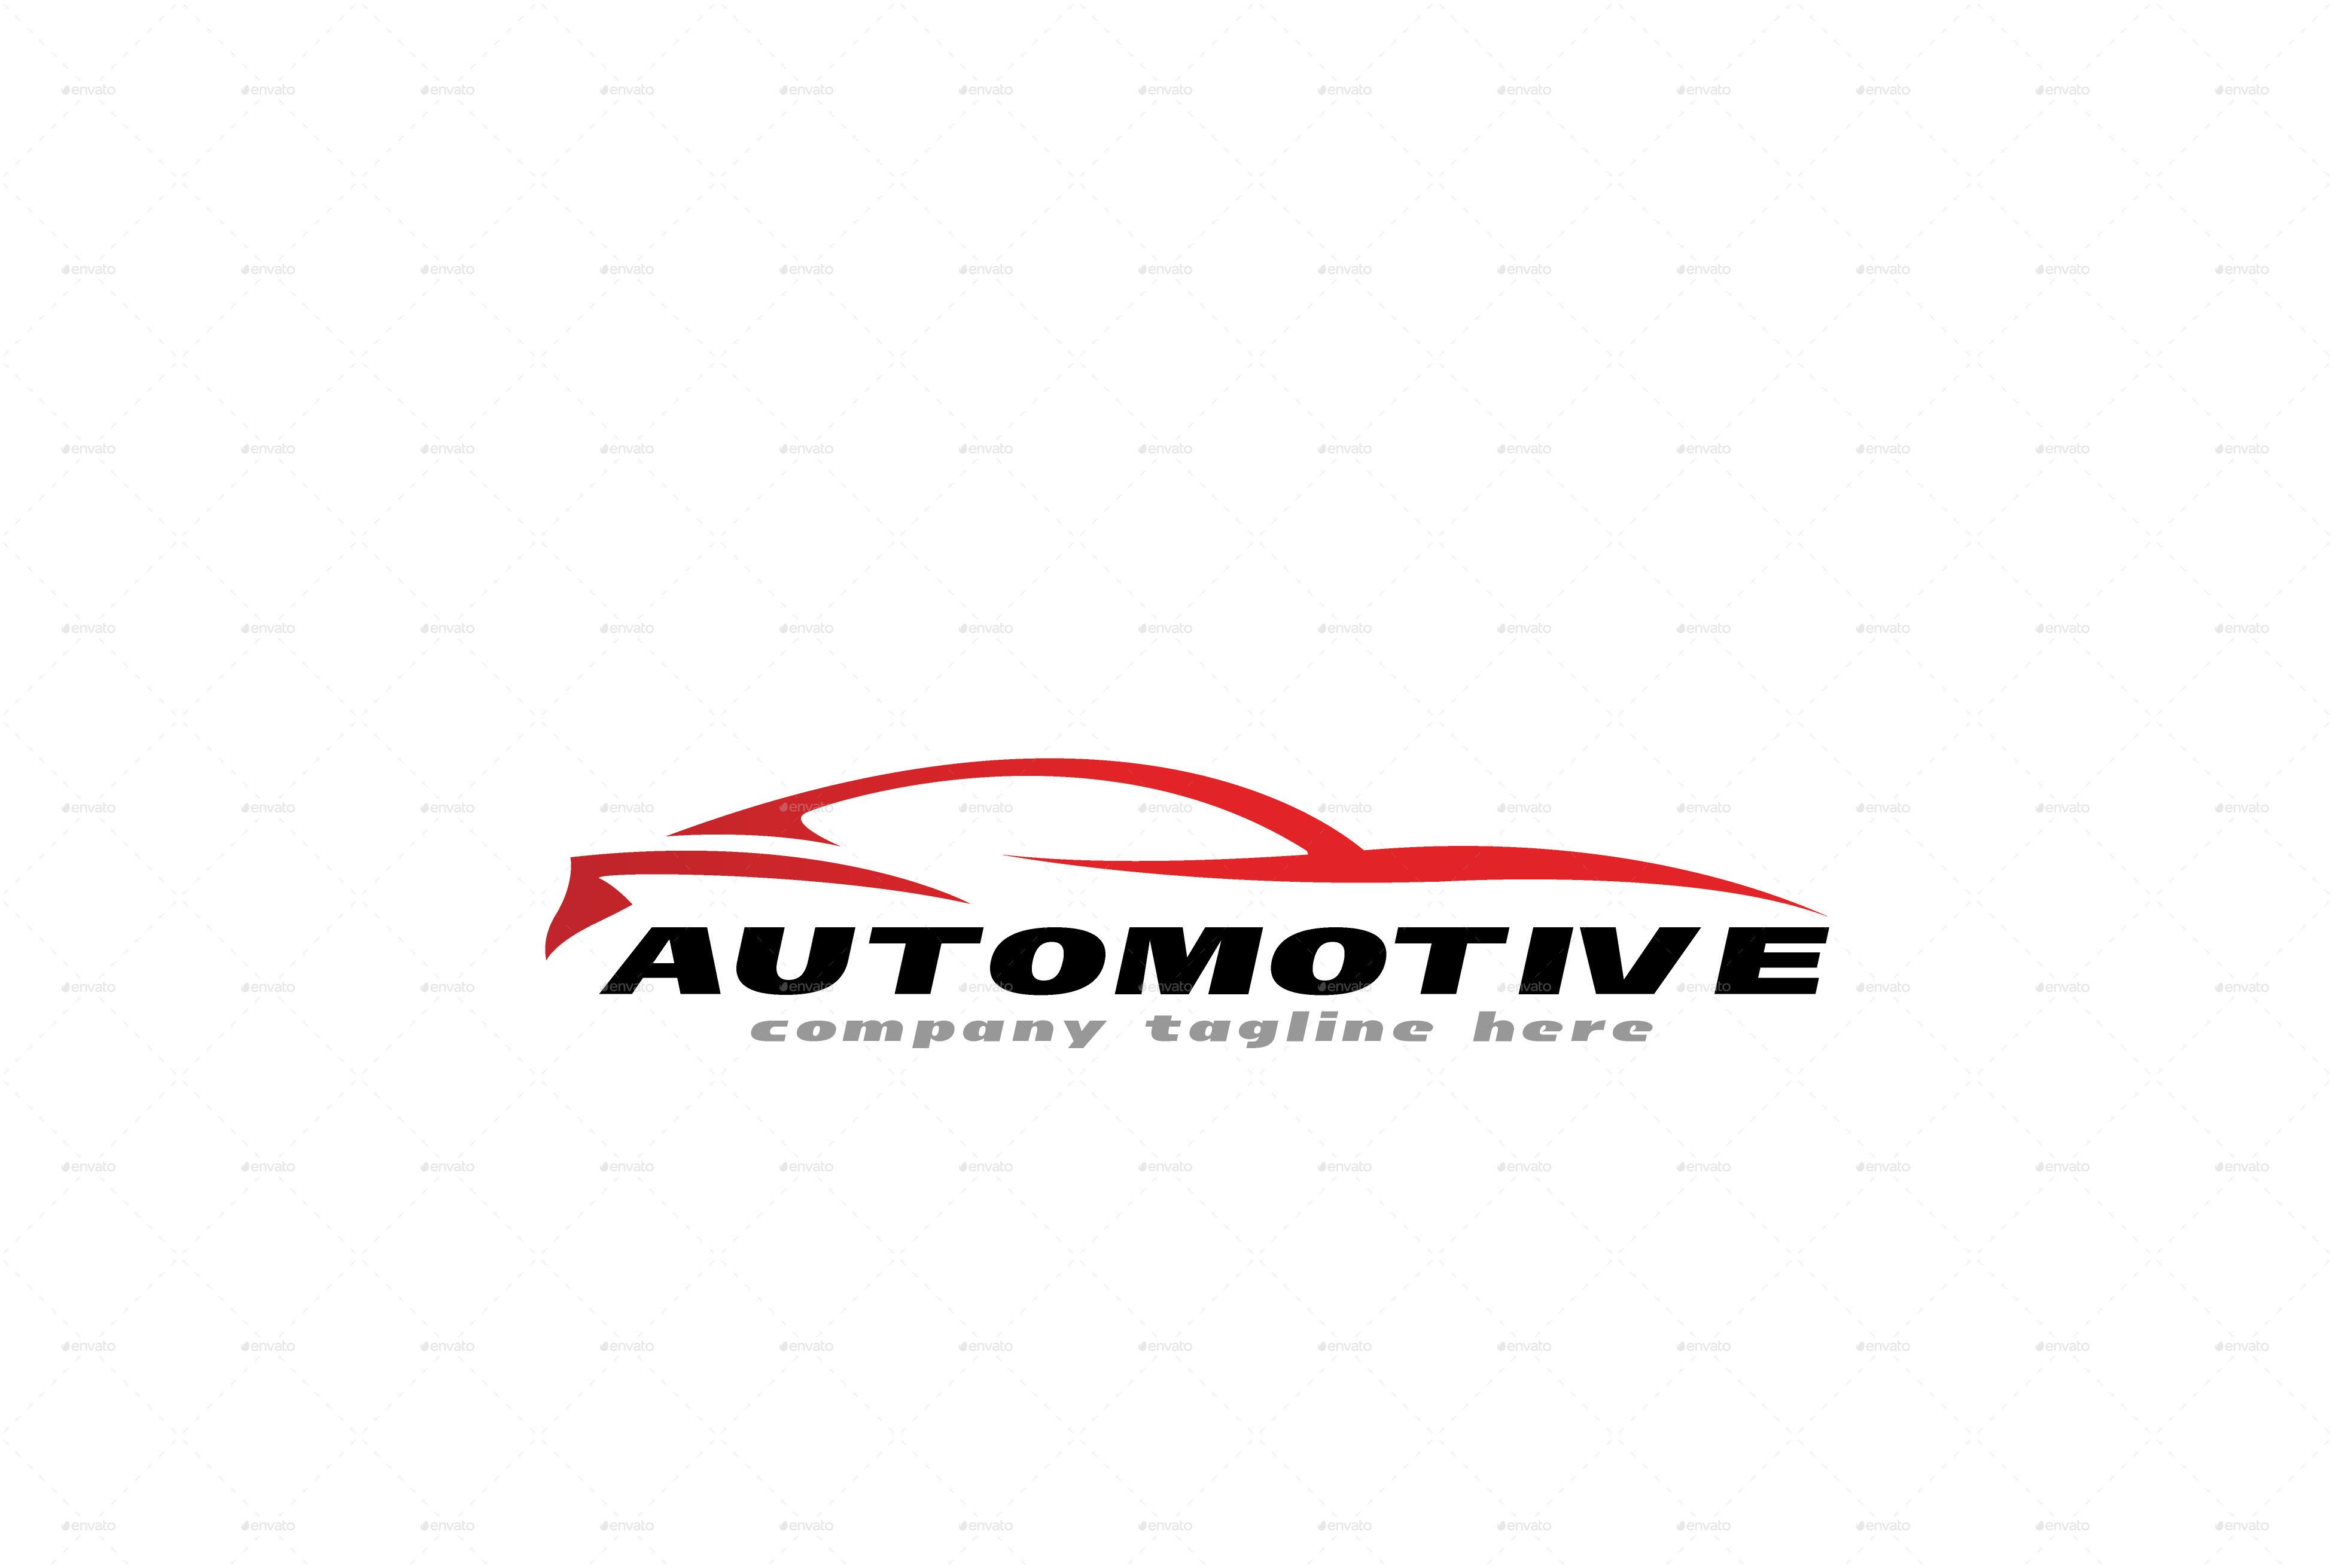 Automotive logo template by 1pointstudio graphicriver for Envato graphicriver